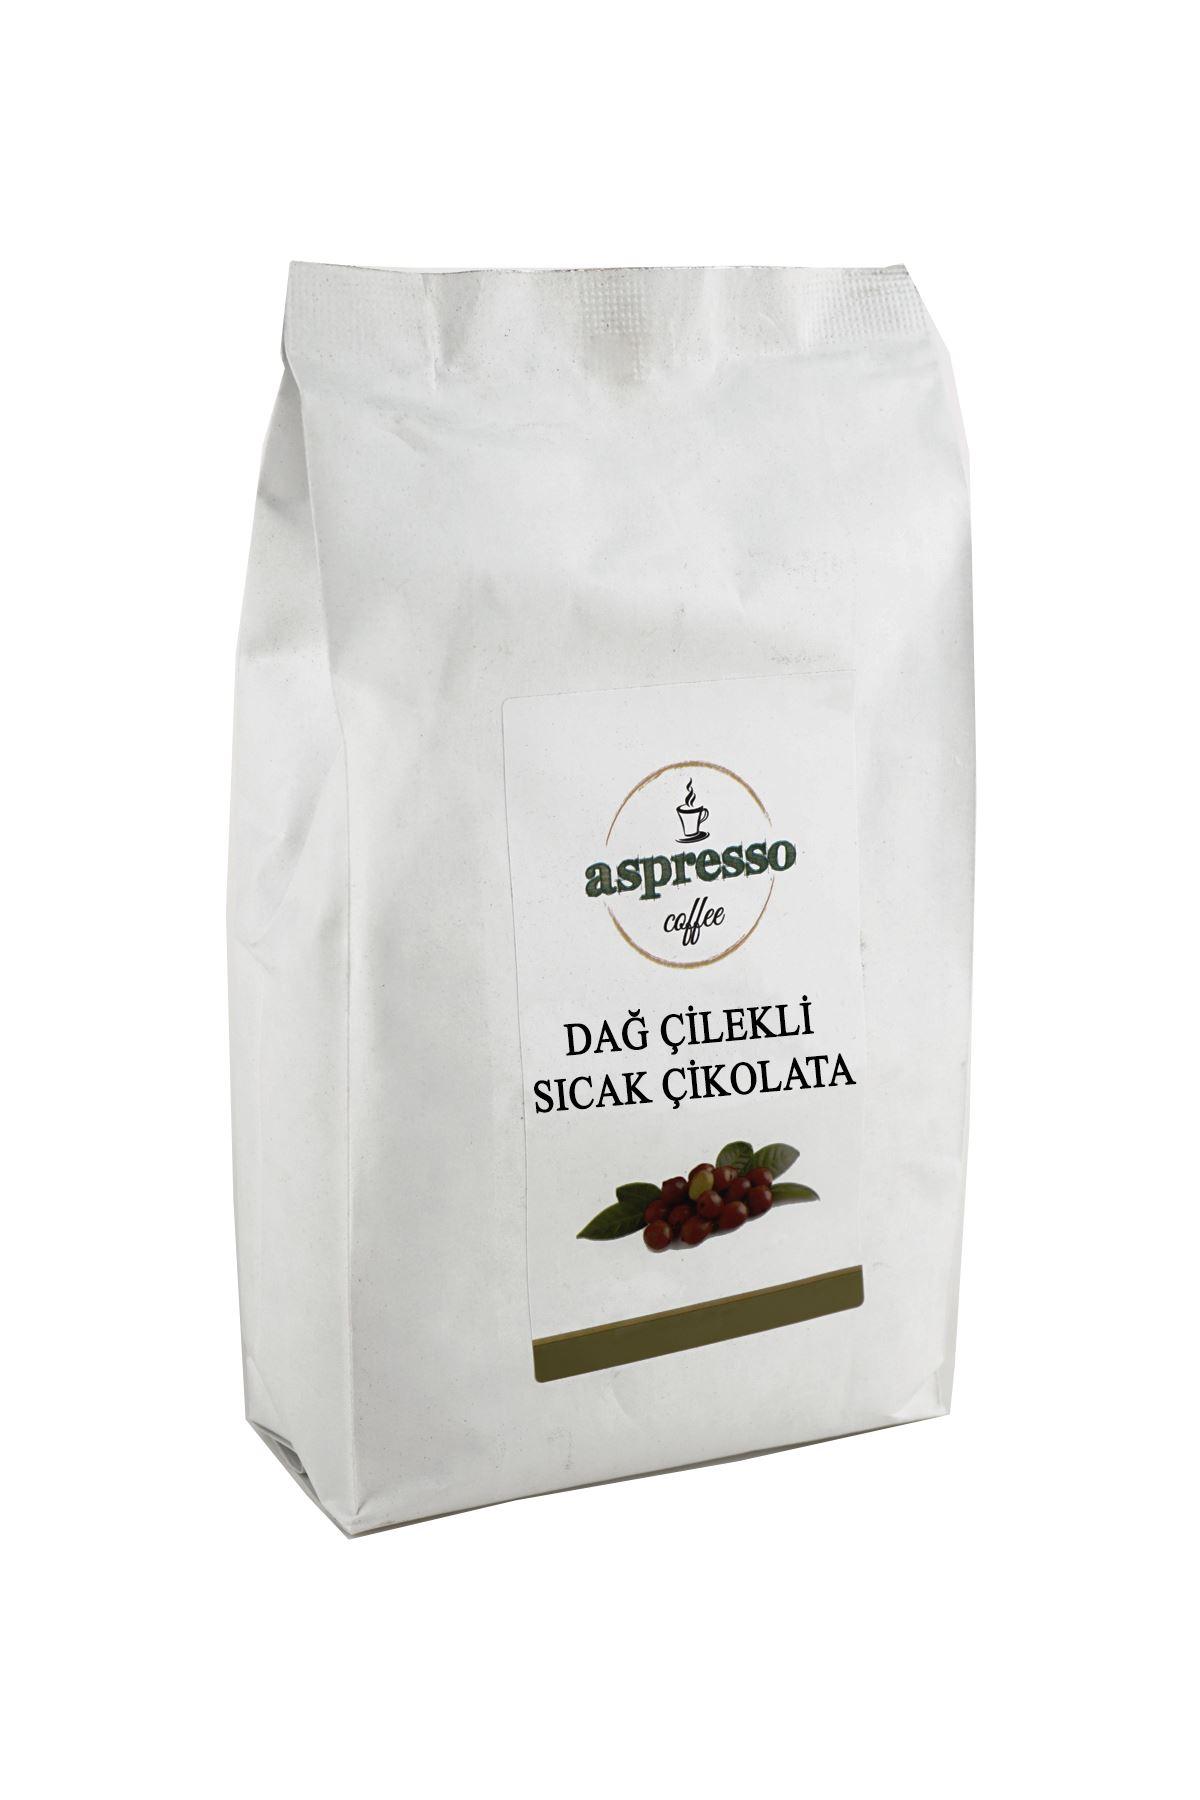 Dağ Çilek Sıcak Çikolata 1000 gr.